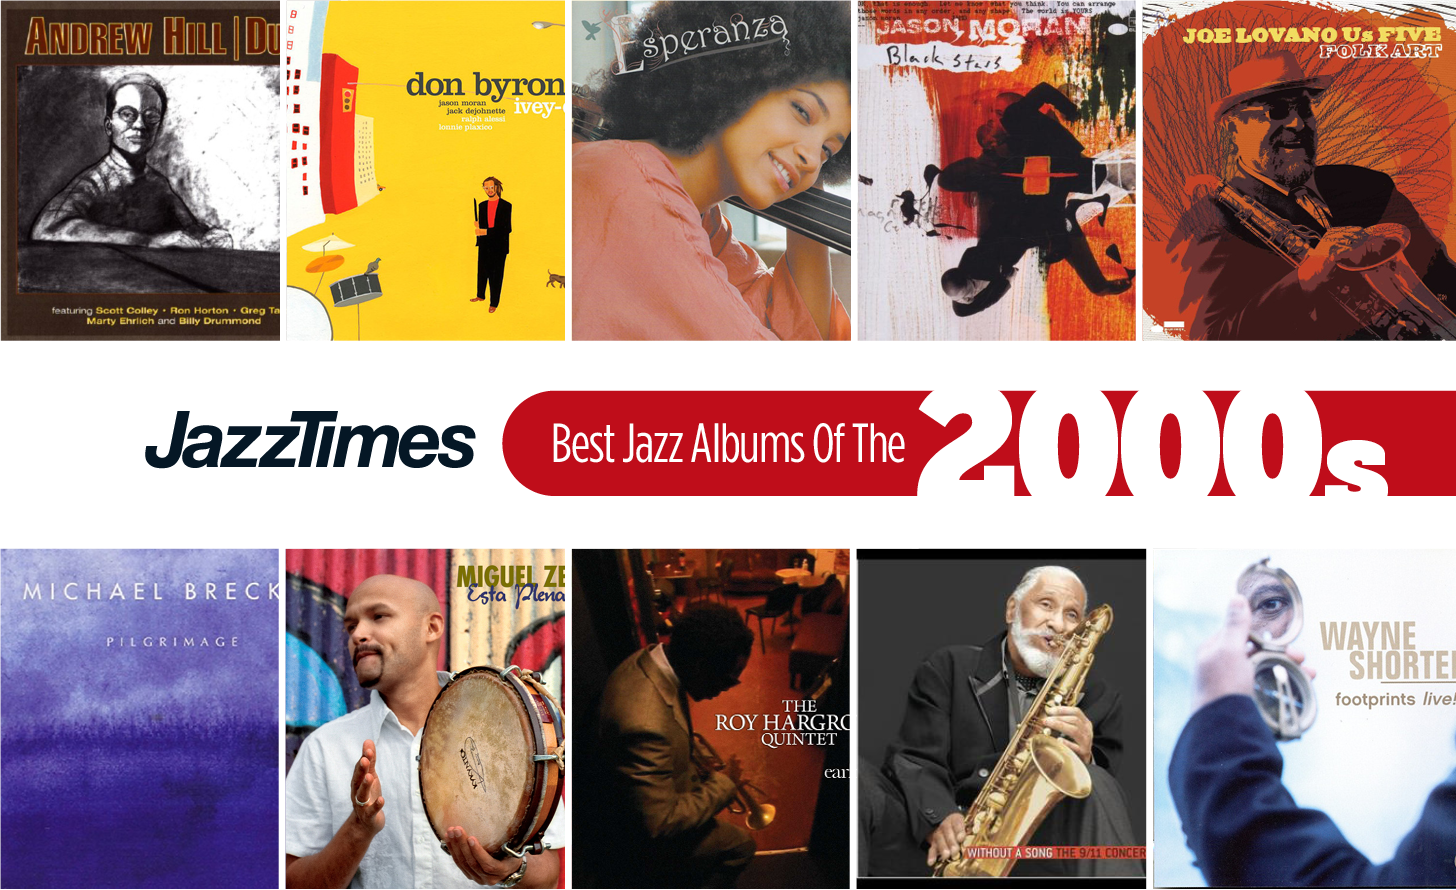 JazzTimes Readers' Poll: The 10 Best Jazz Albums of the 2000s - JazzTimes